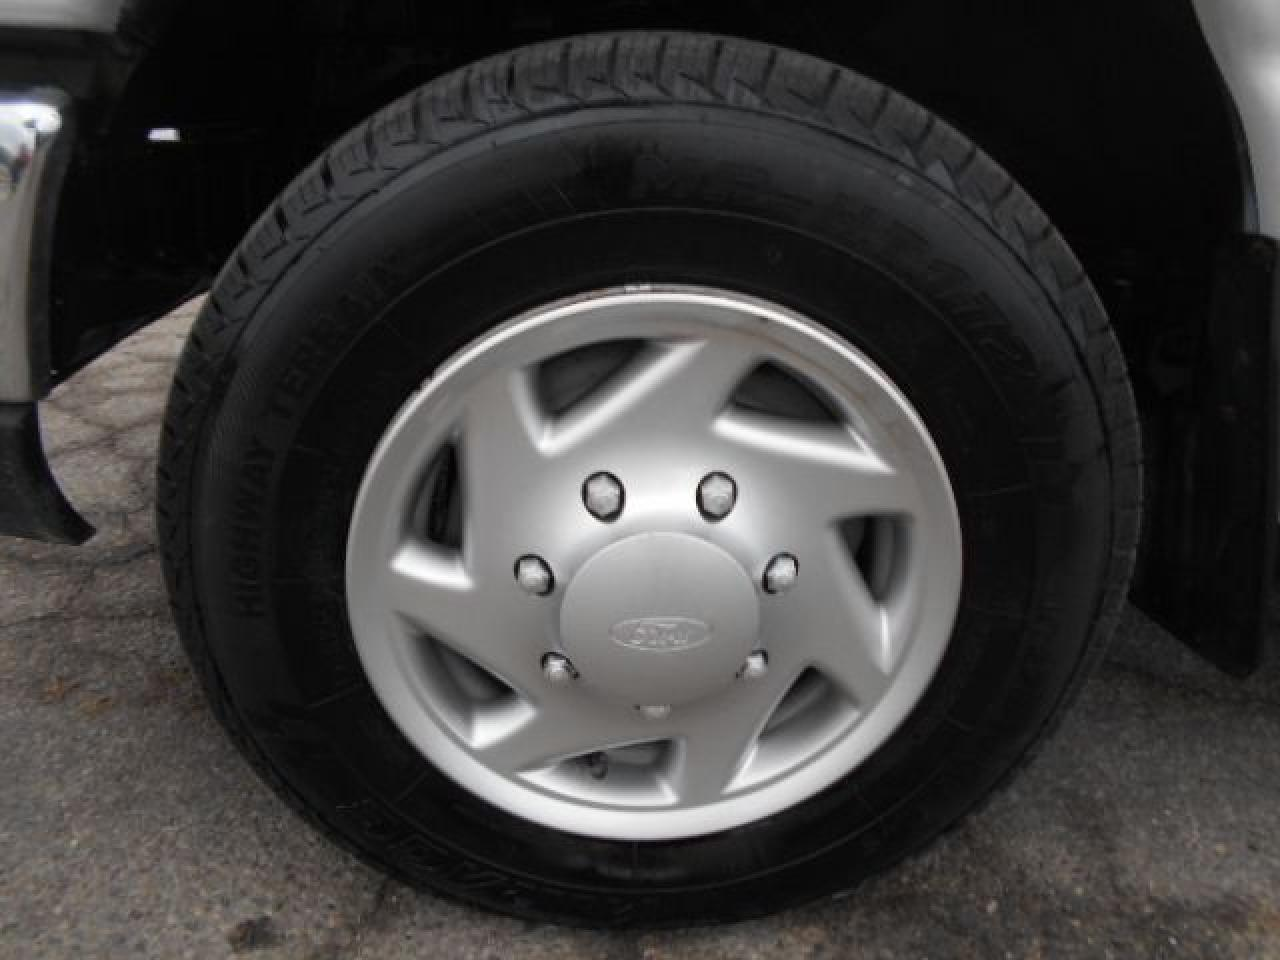 2012 Ford E150 CARGO 4.6L V8 Loaded Divider Shelving Bins 129Km